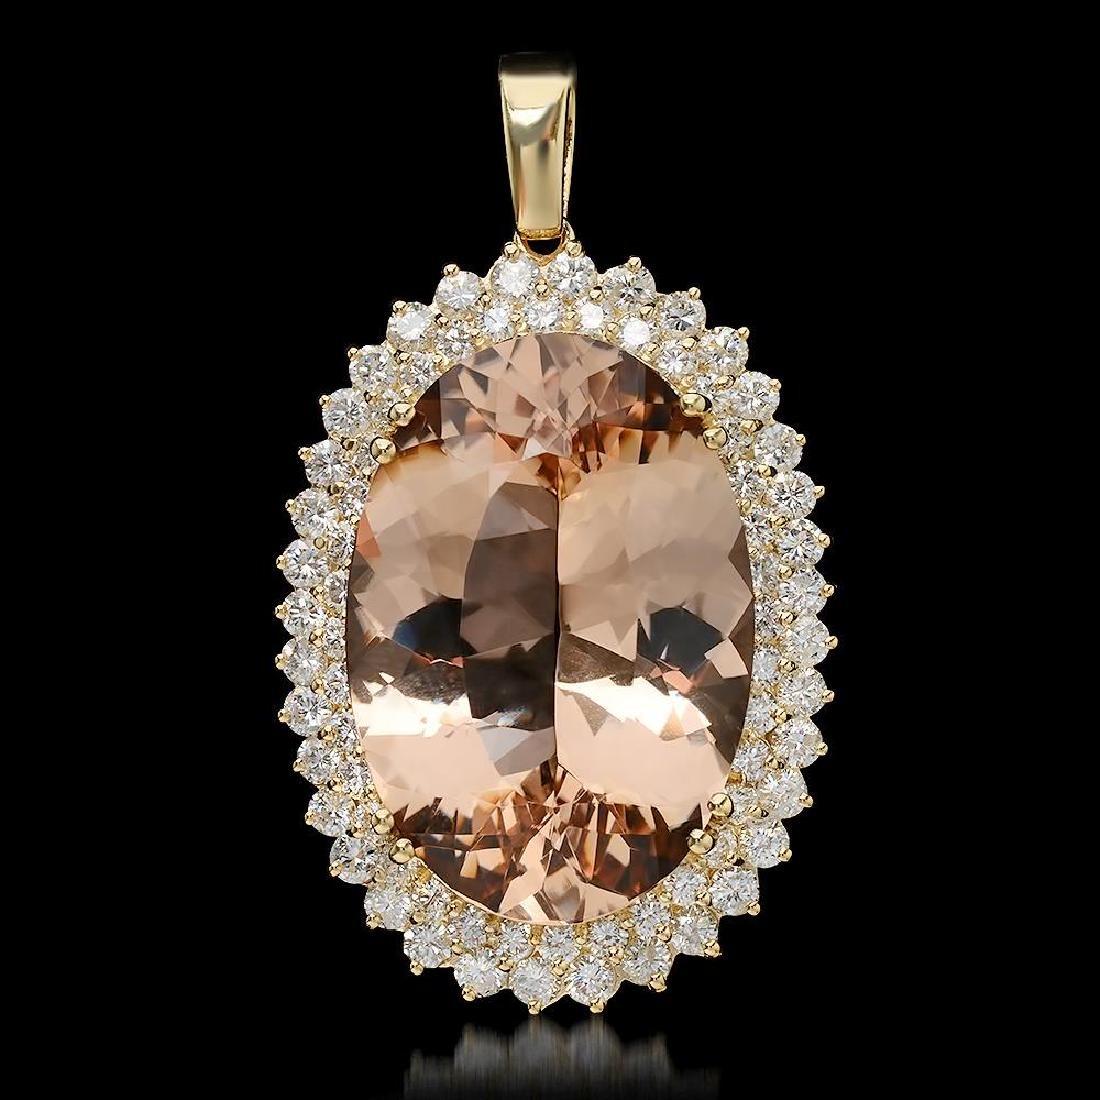 14K Gold 40.22ct Morganite 4.15ct Diamond Pendant